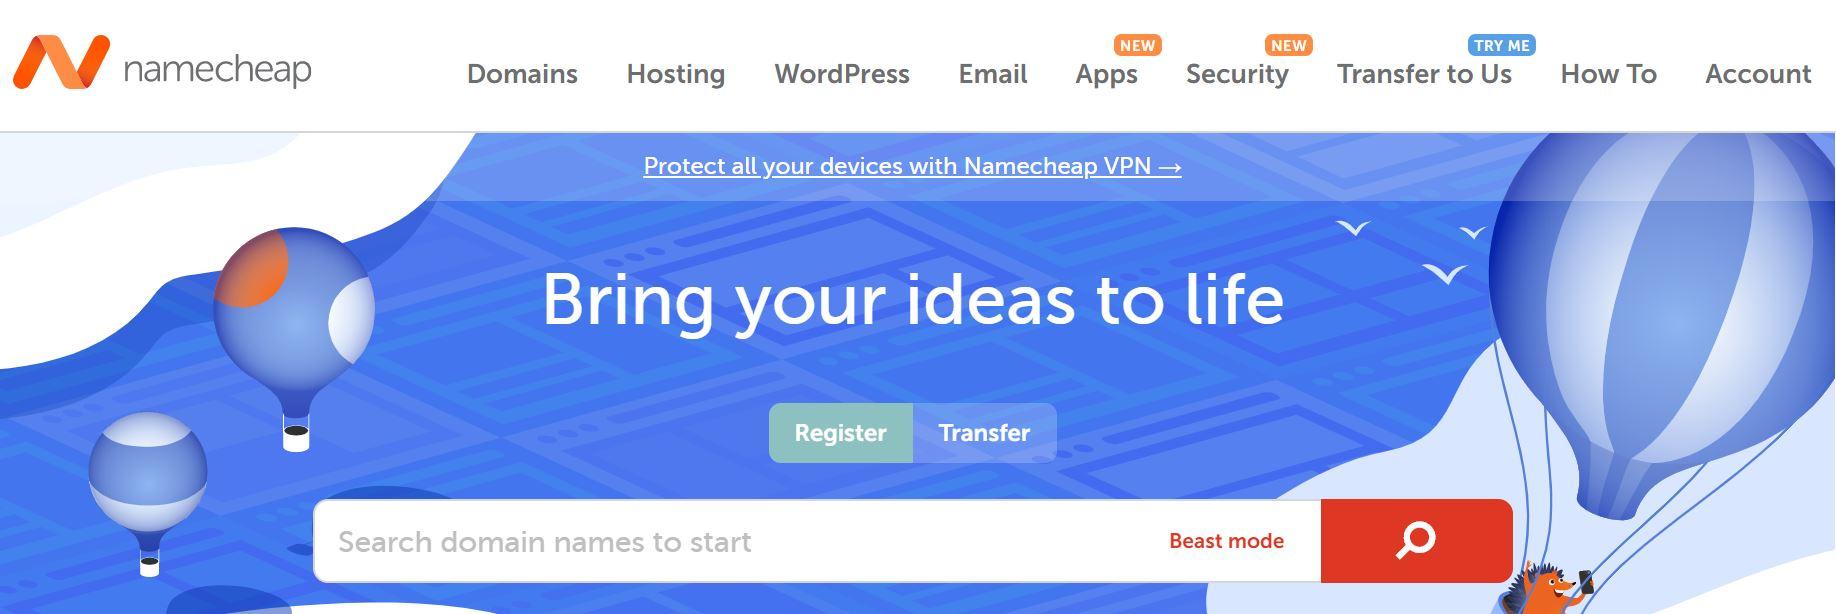 Namecheap是强大的GoDaddy替代产品,因为它们提供托管和域名注册。